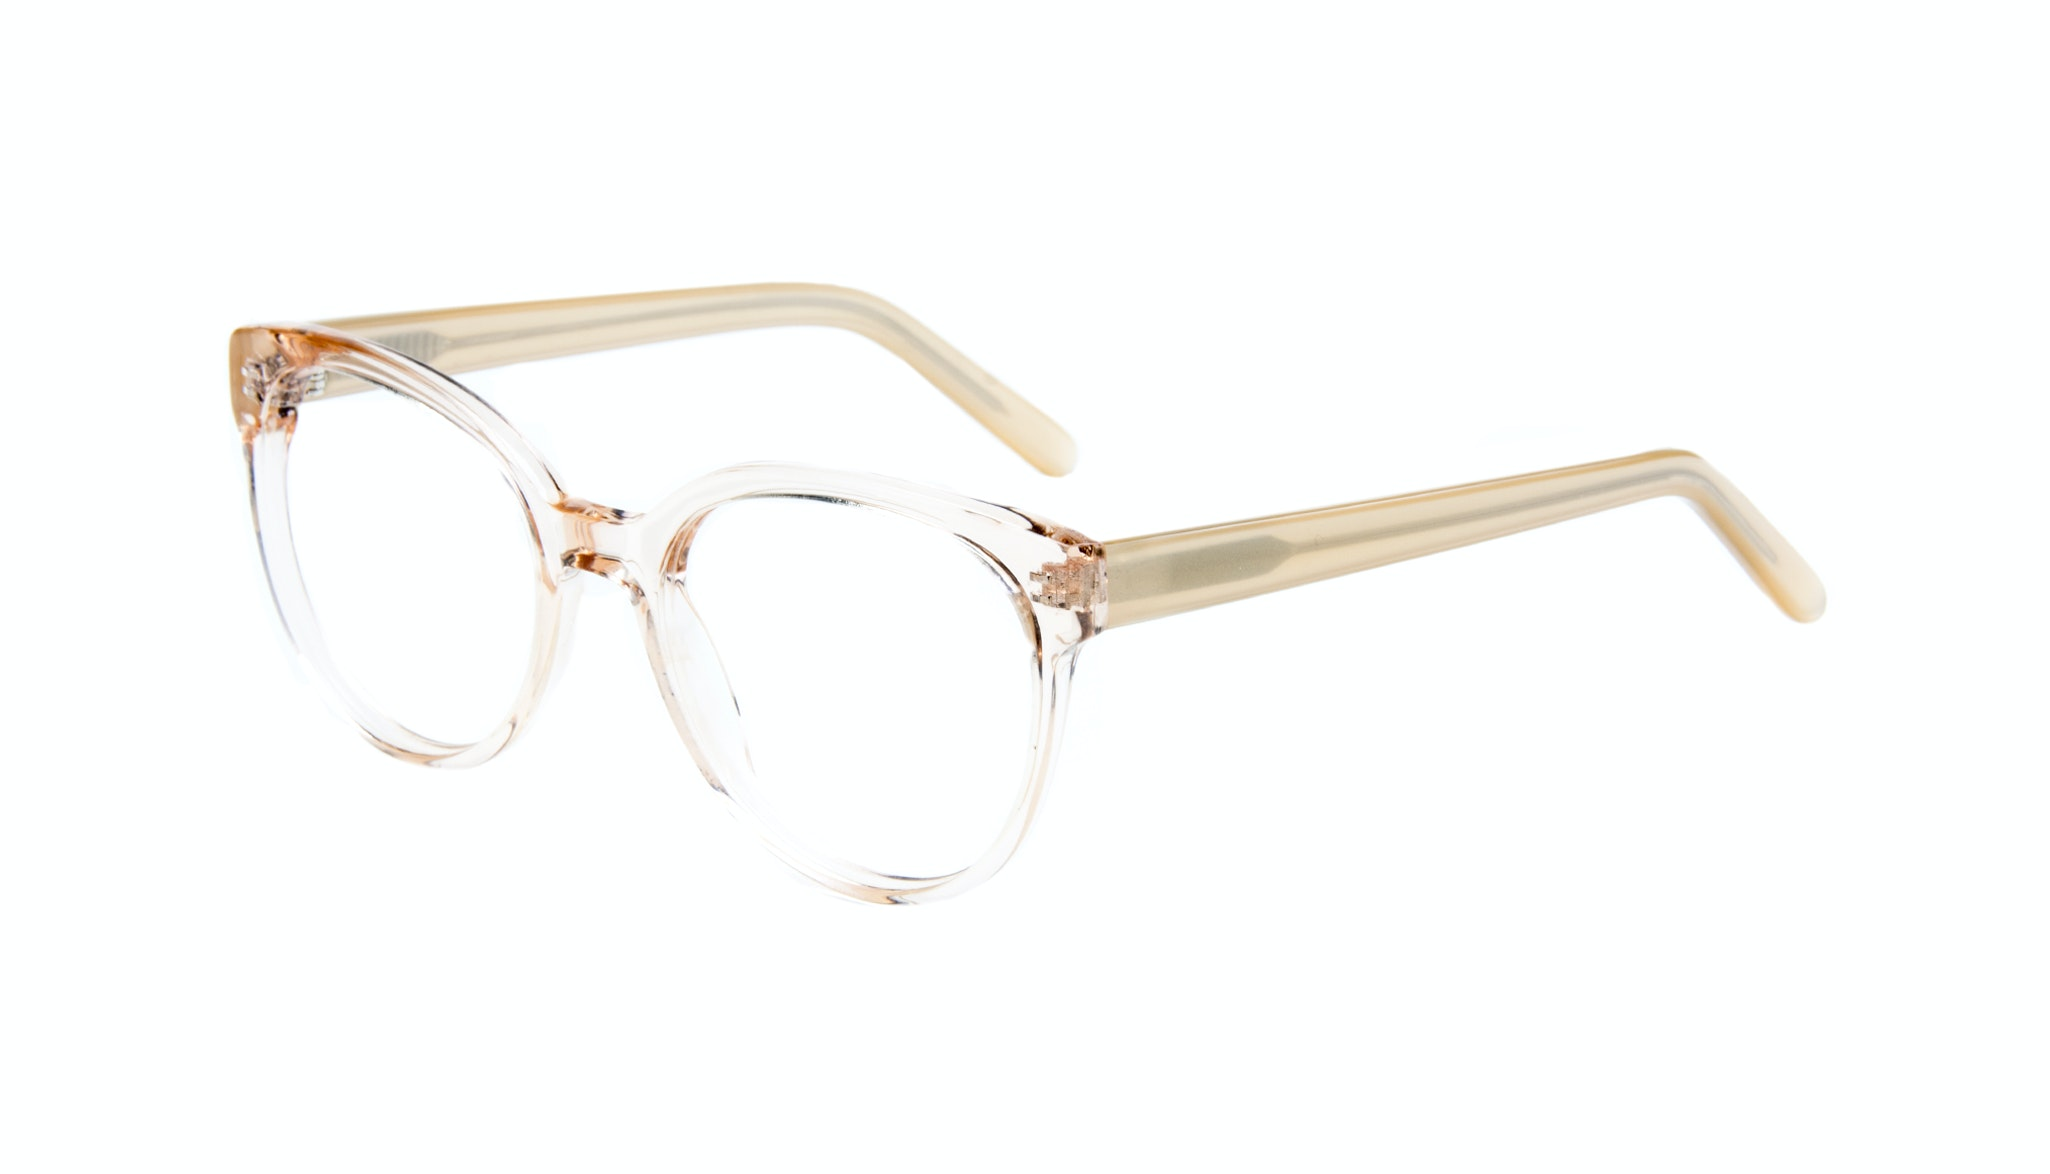 Affordable Fashion Glasses Cat Eye Round Eyeglasses Women Eclipse Blond Metal Tilt